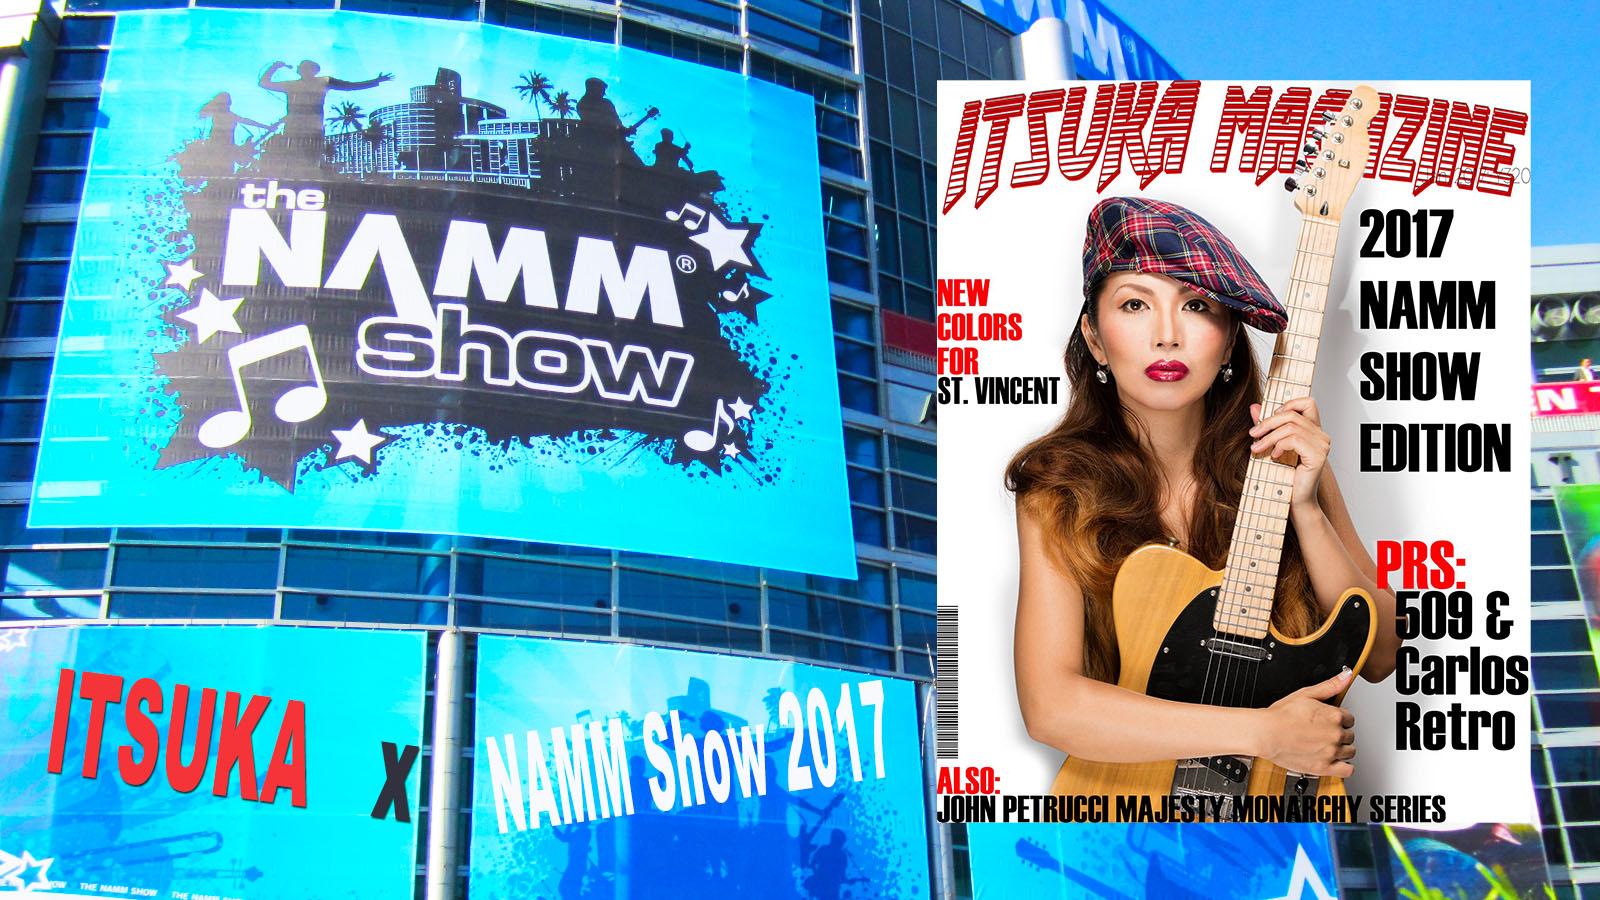 NAMM SHWO 2017 現地から生レポート!